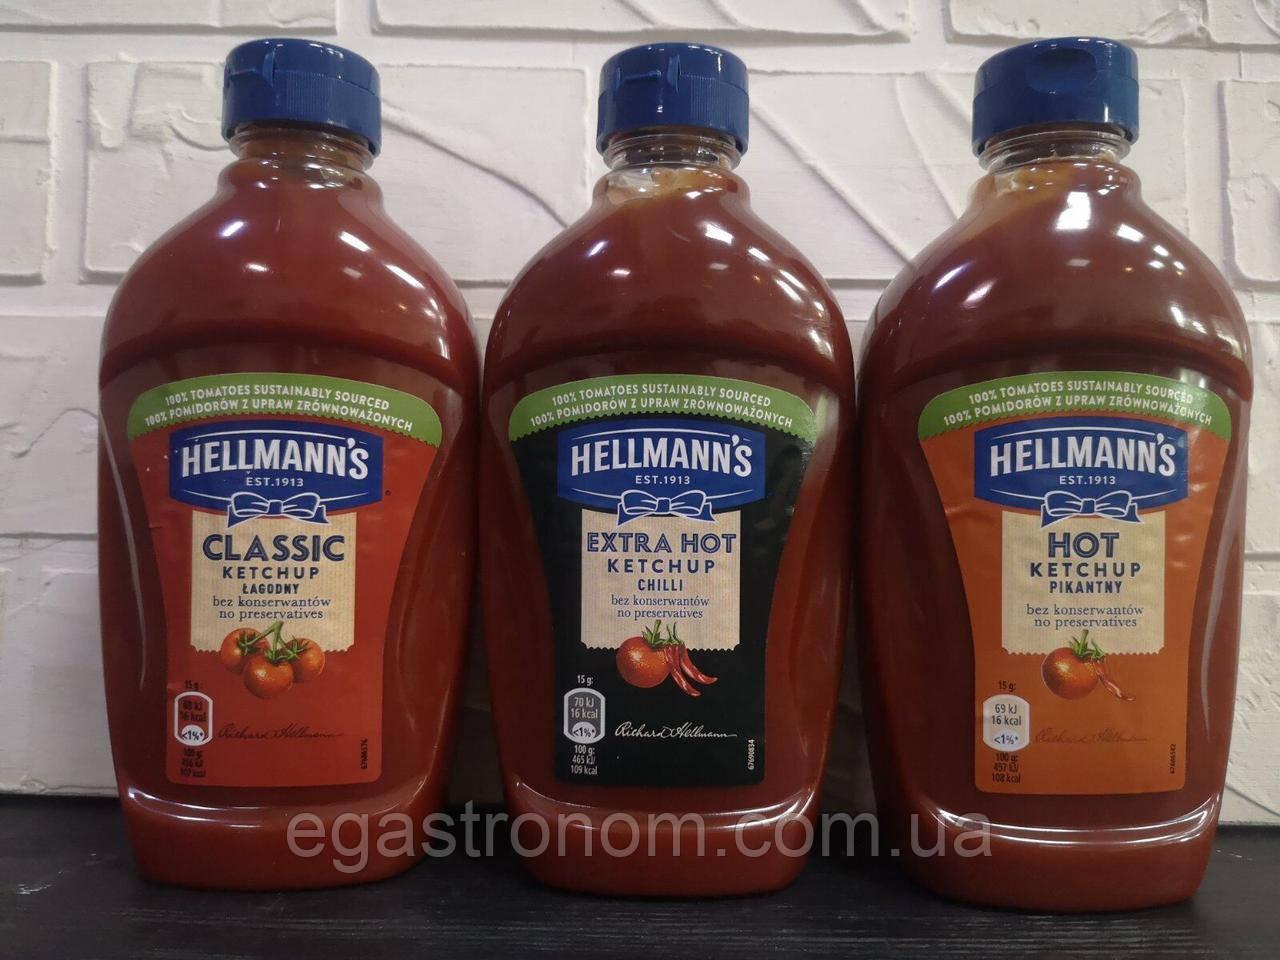 Кетчуп Хеллманс екстра хот Hellmann's 12 шт/ящ 485g (Код : 00-00003729)